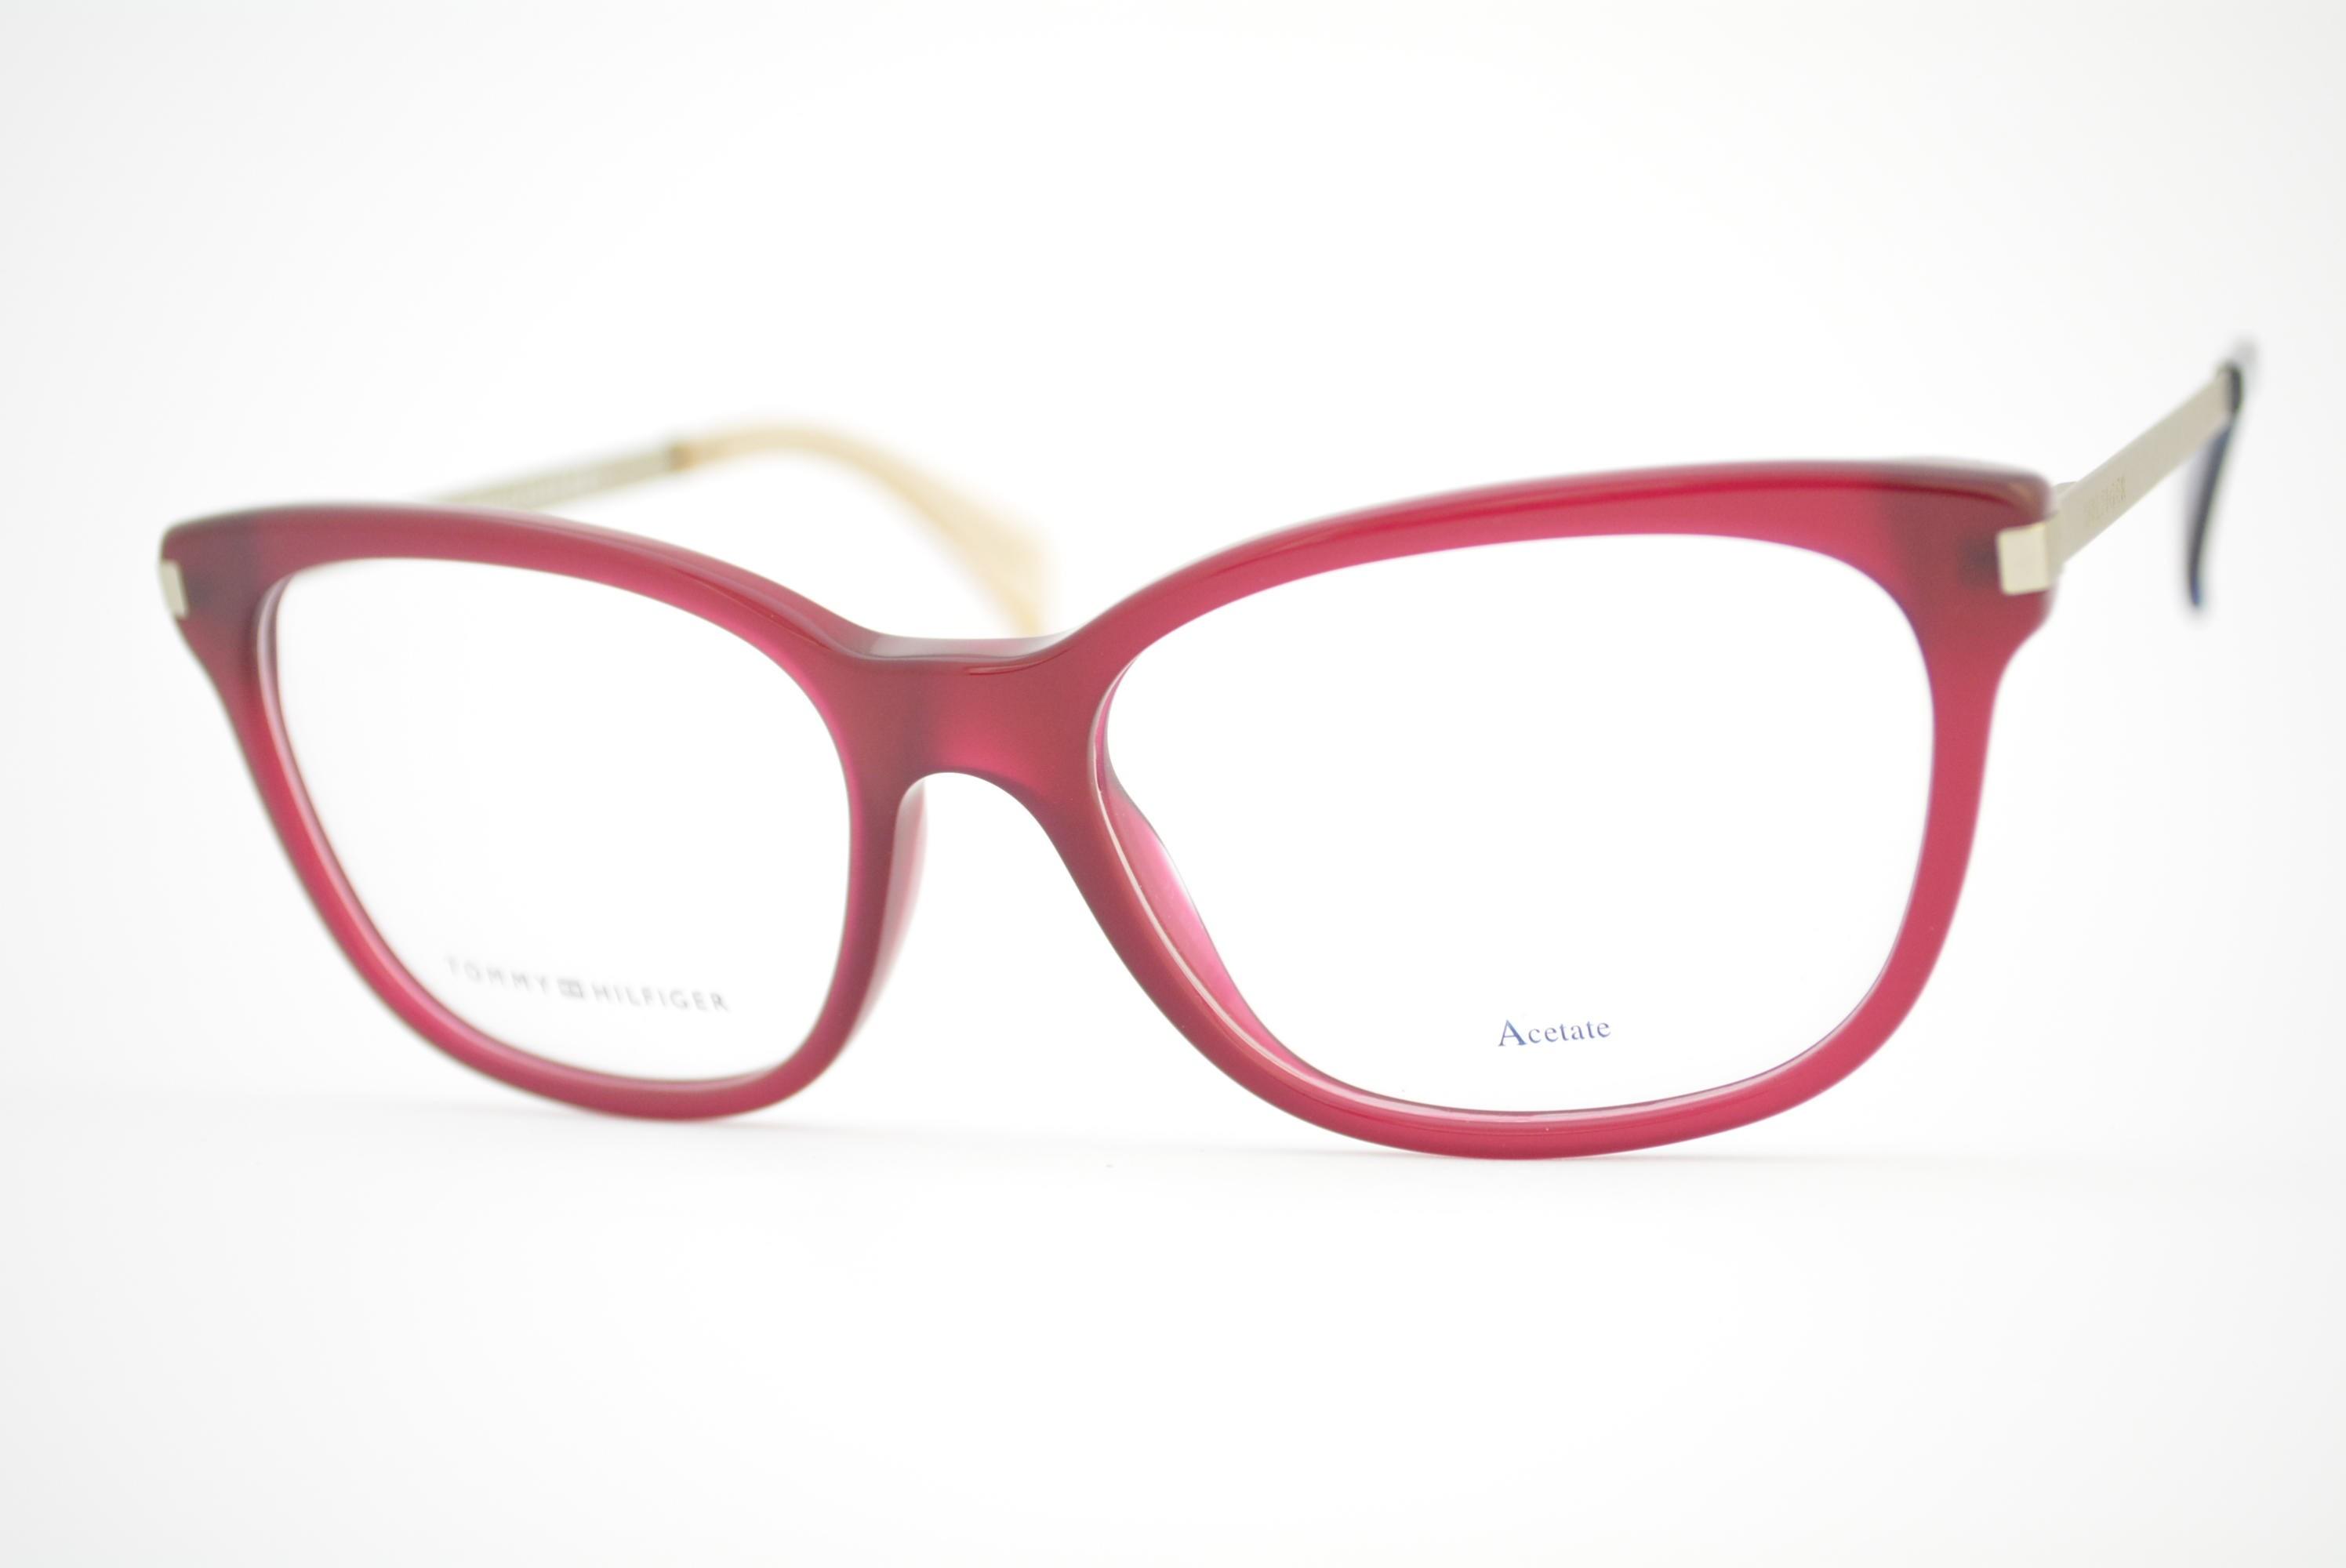 c8ace89ea2dab armação de óculos Tommy Hilfiger mod th1381 QEI